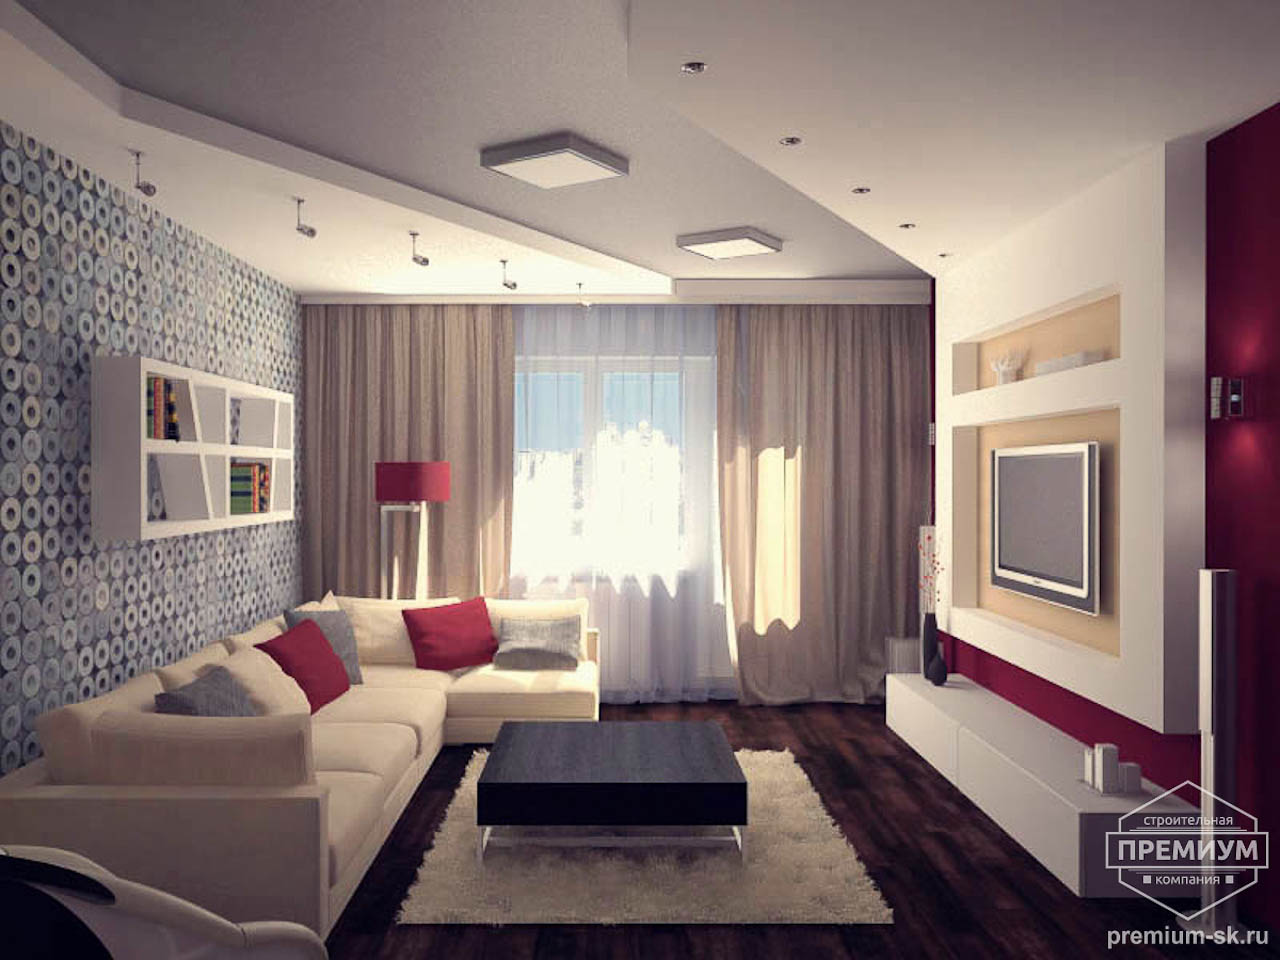 Дизайн интерьера однокомнатной квартиры по ул. Сыромолотова 11 img1660478240